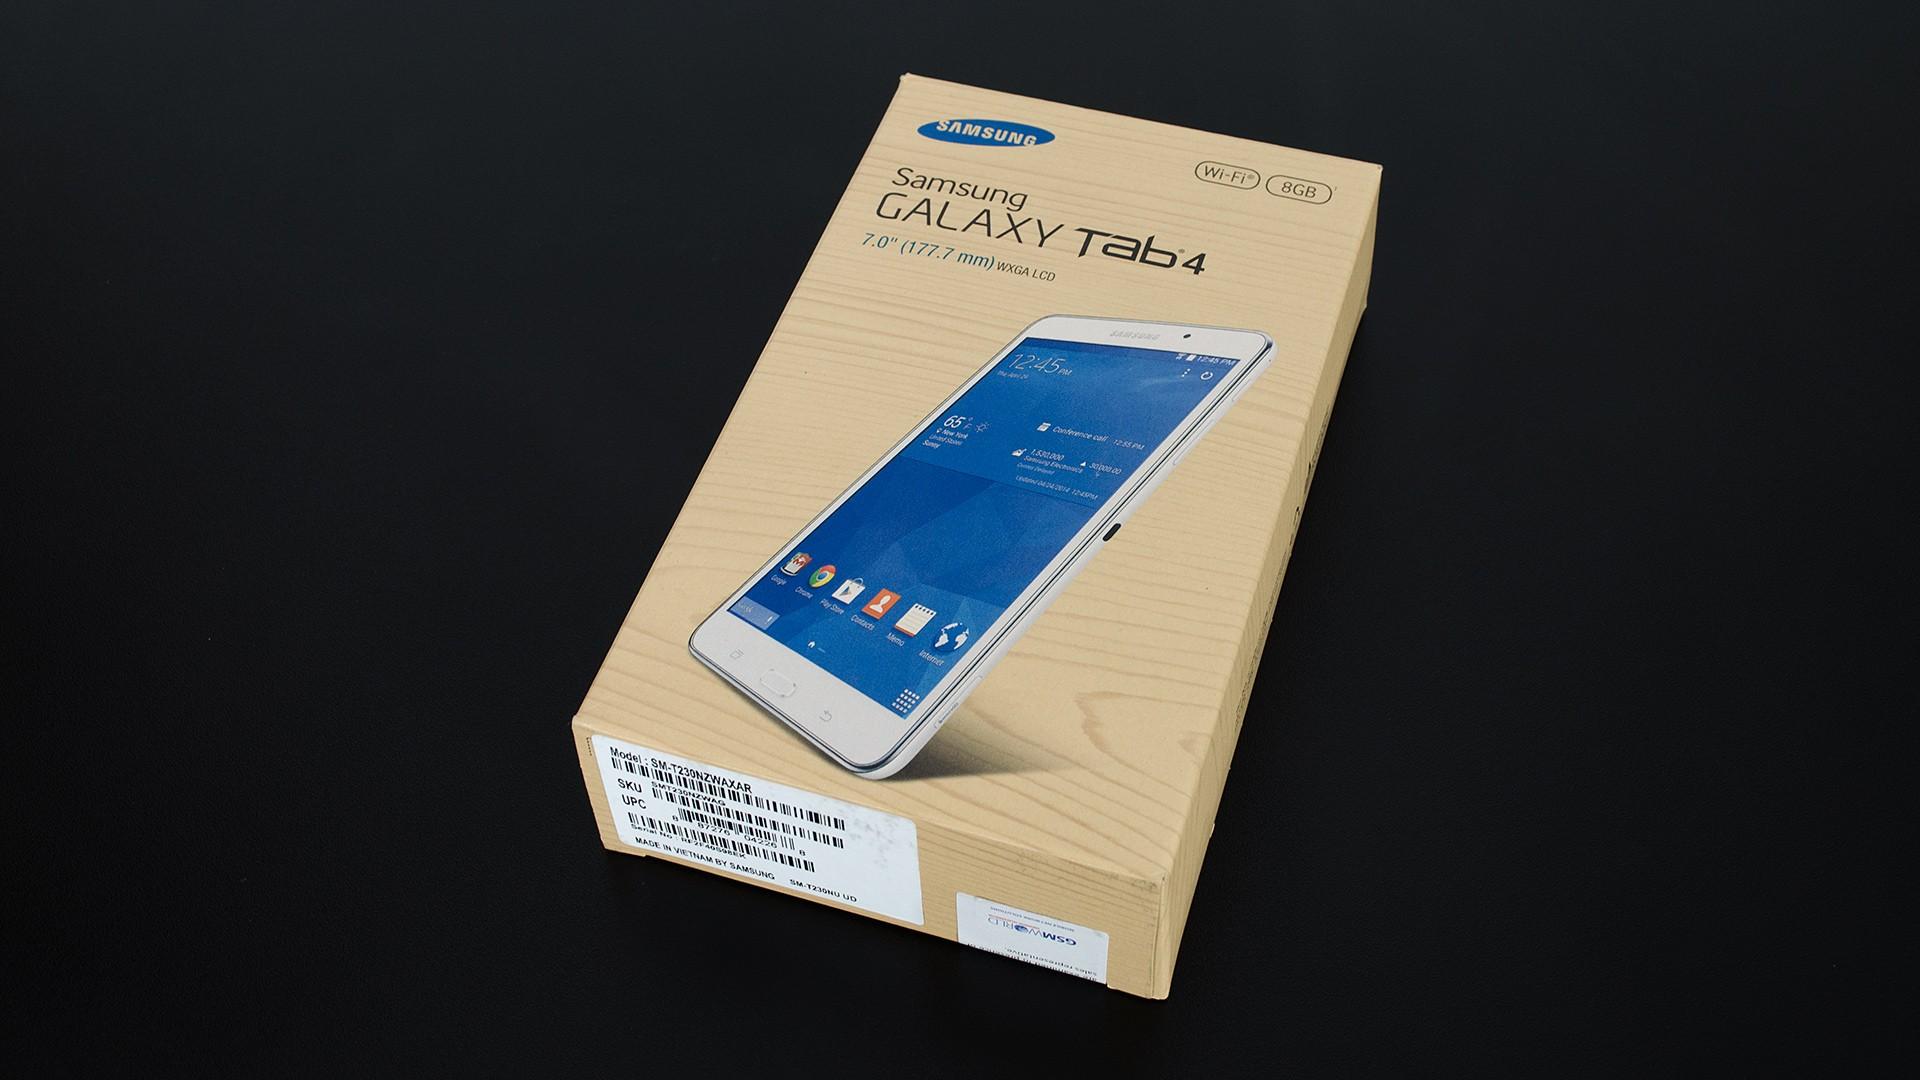 Samsung Galaxy Tab 4 7 0 Review